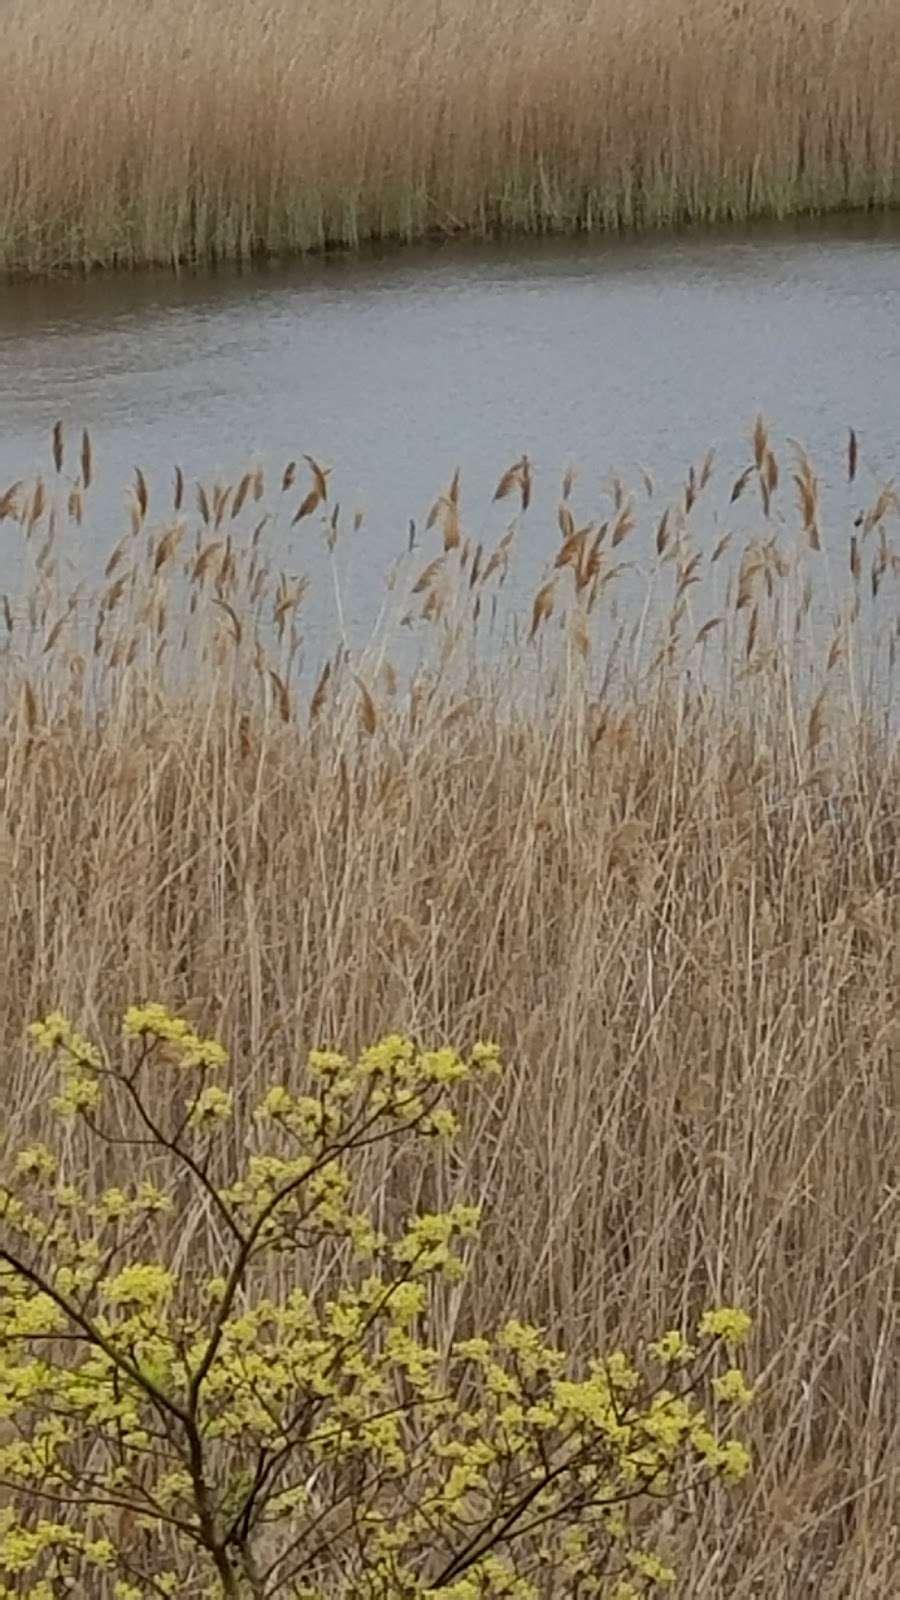 Ridgewood Reservoir - park    Photo 5 of 9   Address: Jackie Robinson Pkwy, Brooklyn, NY 11208, USA   Phone: (212) 639-9675